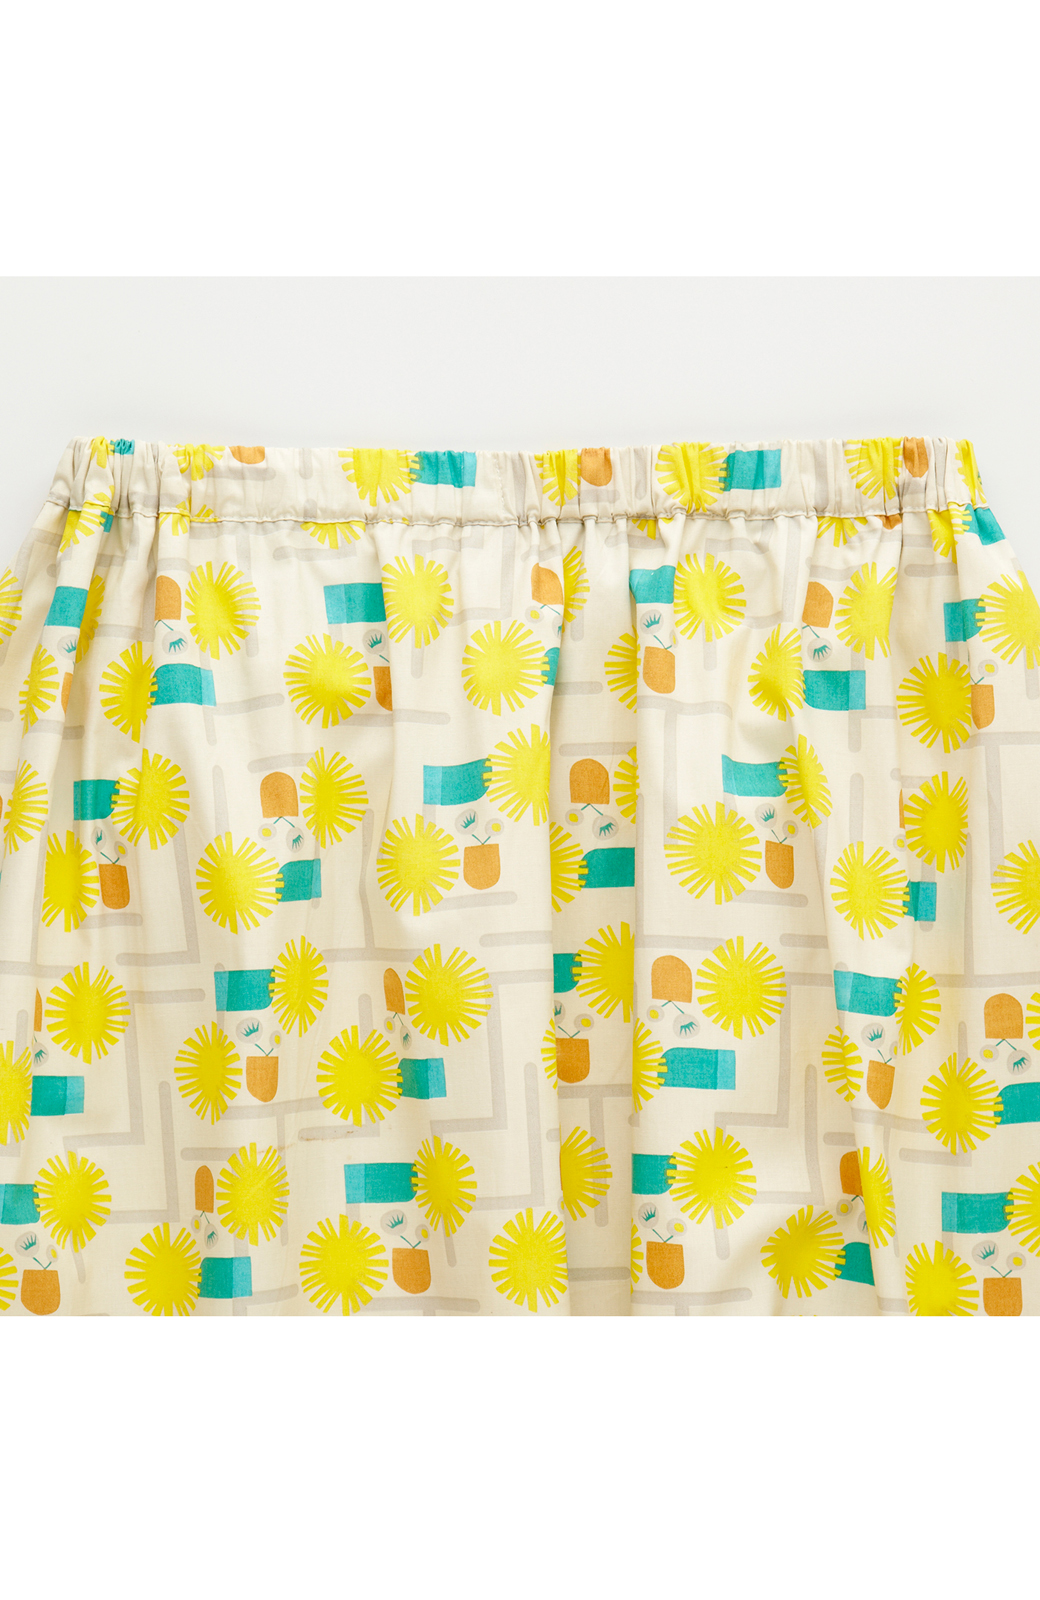 haco! ユニカラート 漆嶌知子 たんぽぽ スカート <イエロー>の商品写真3